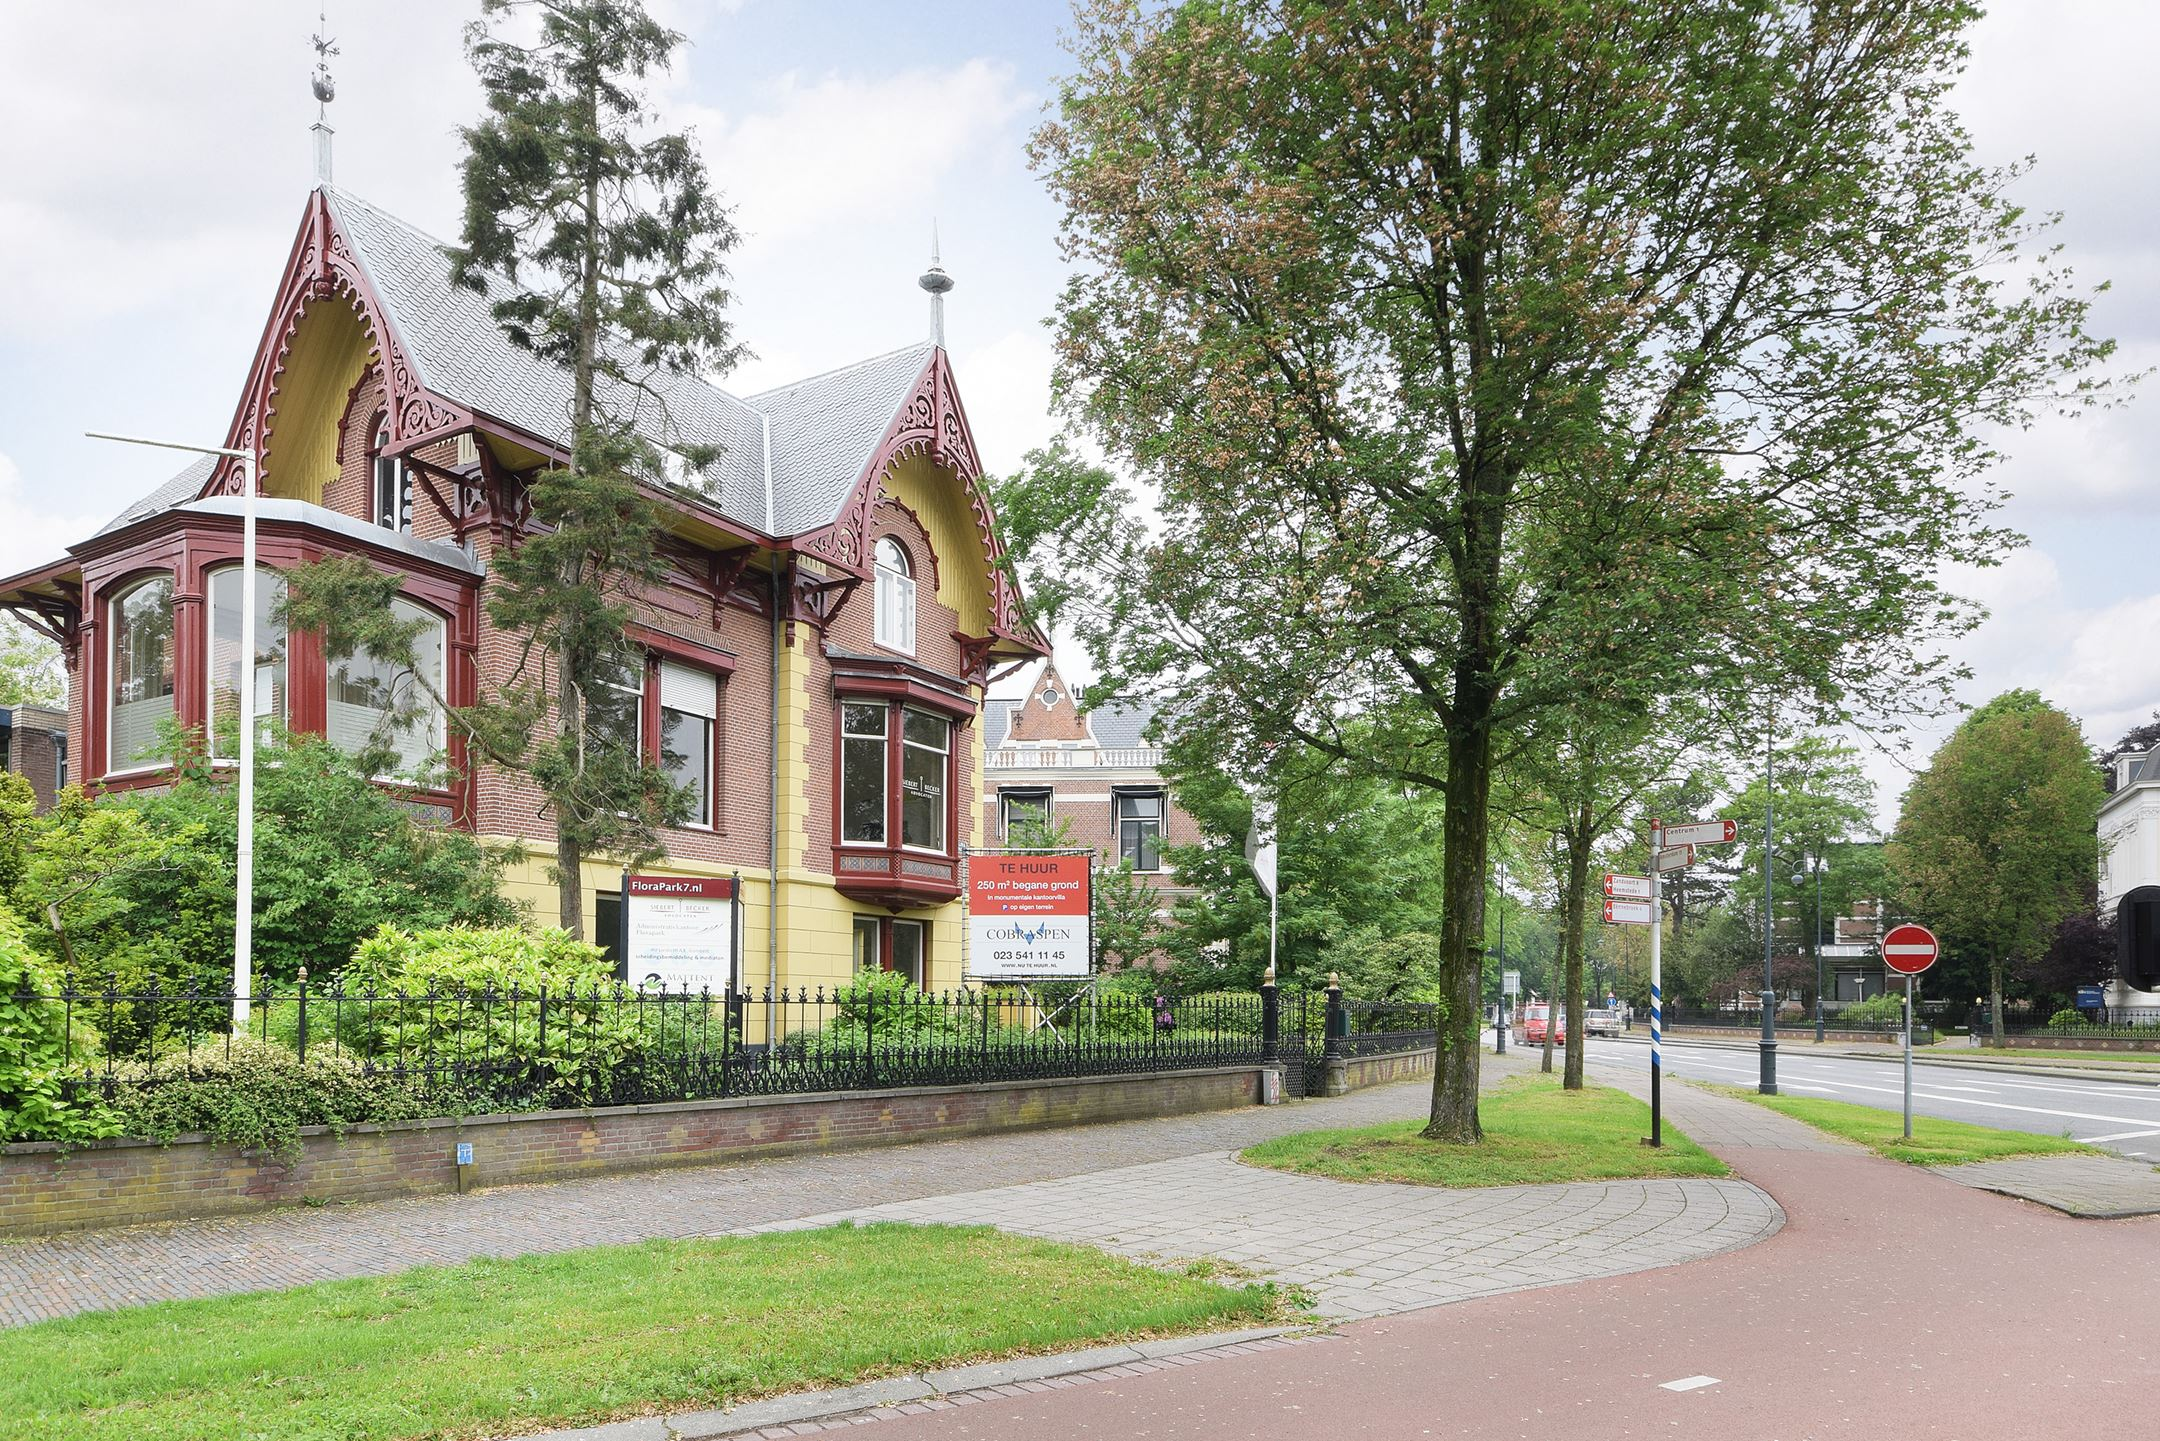 Haarlem zoek verhuurd florapark 7 2012 hk haarlem for Funda haarlem centrum